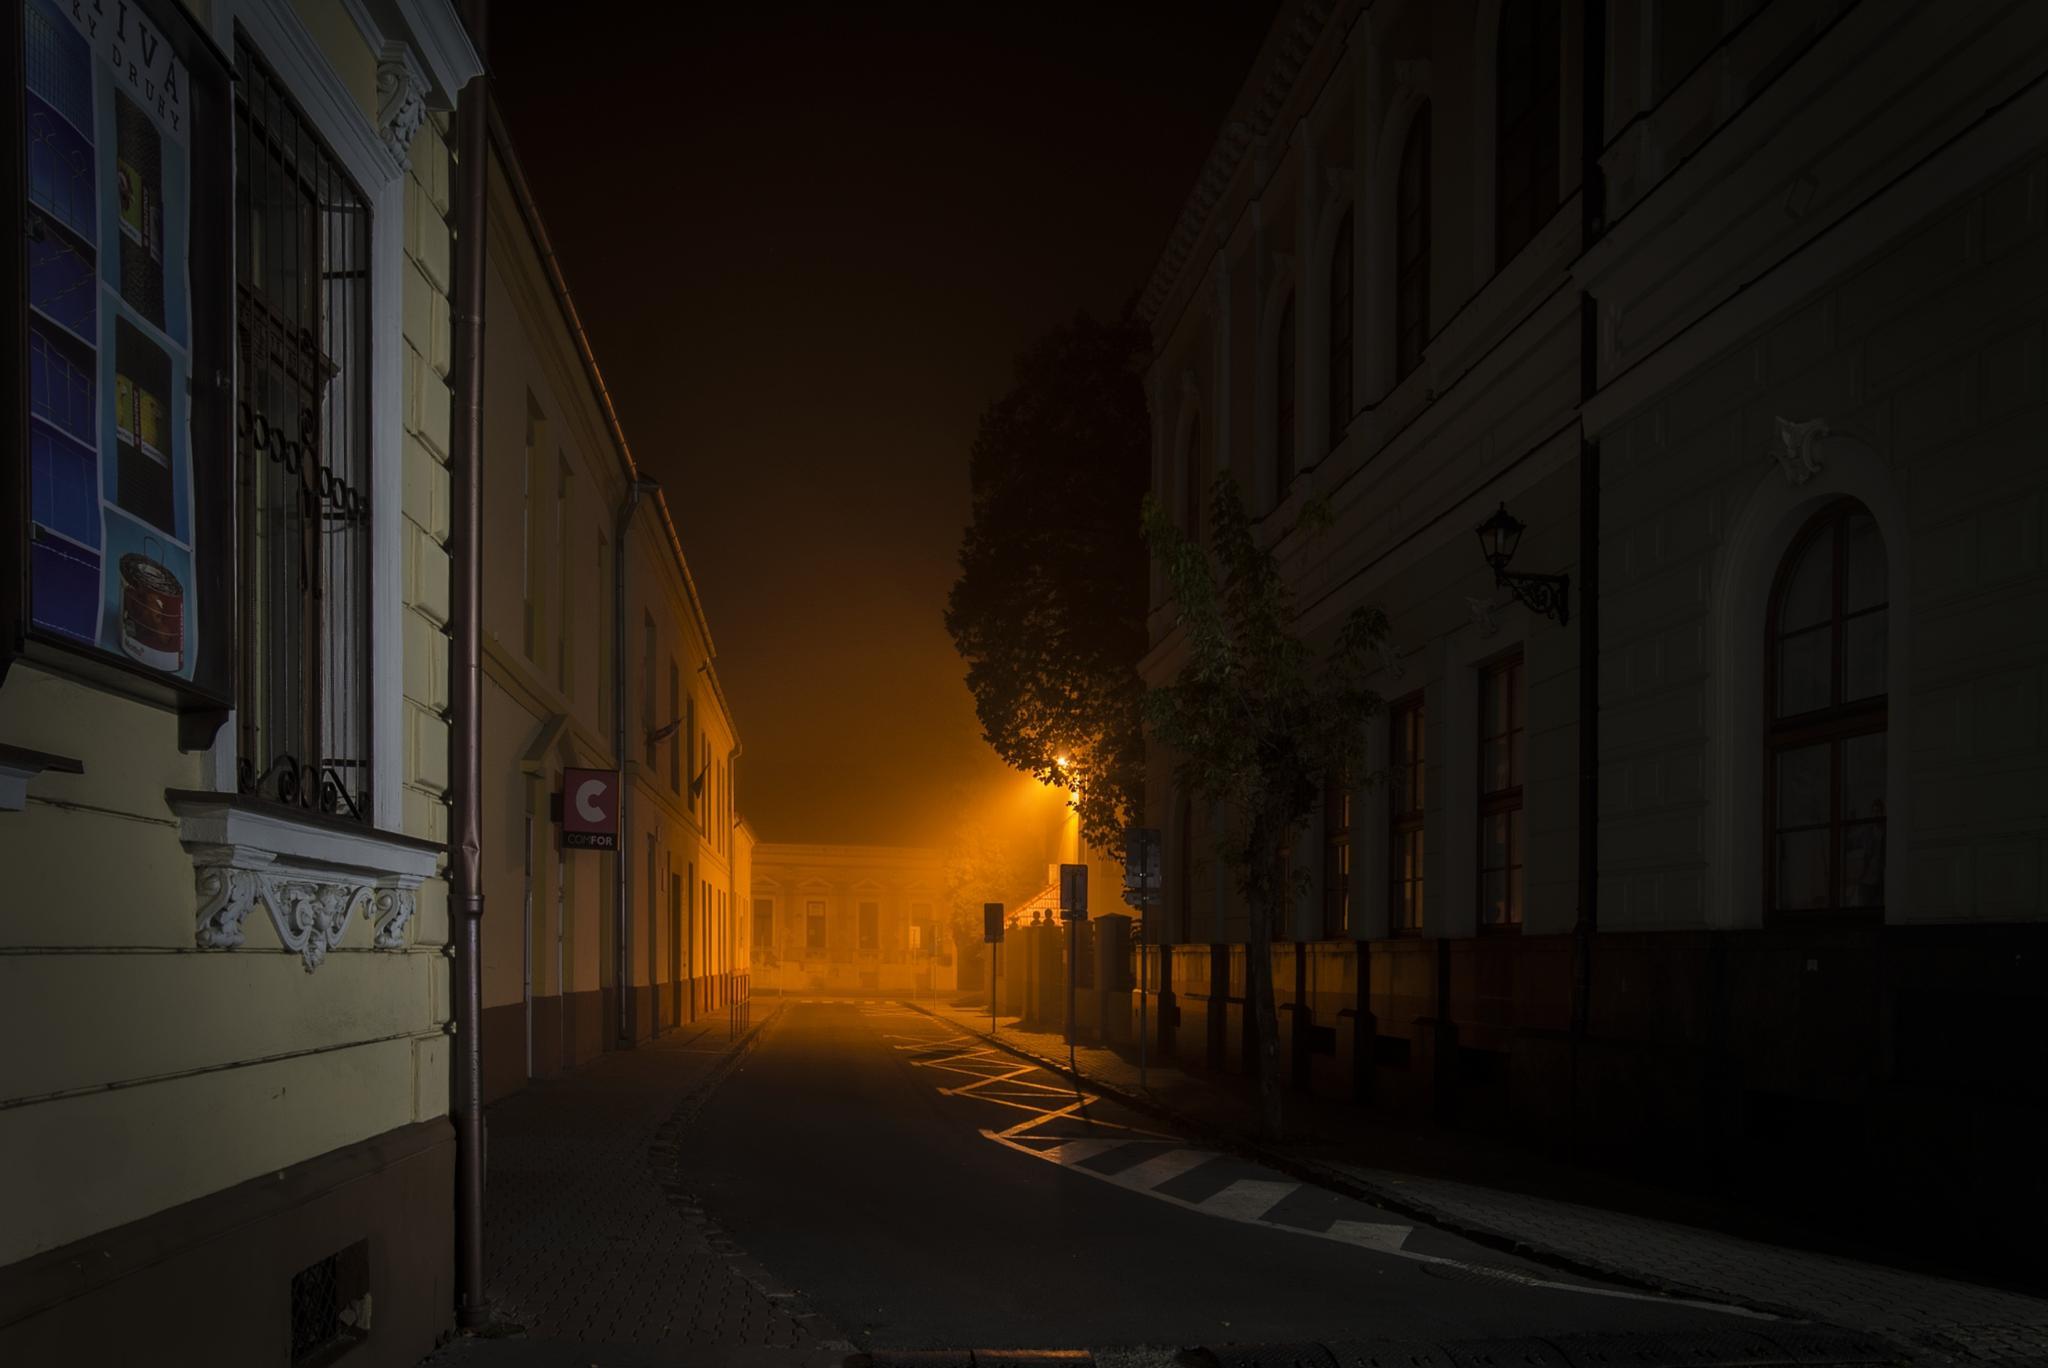 Night street by Jožo Kozlok